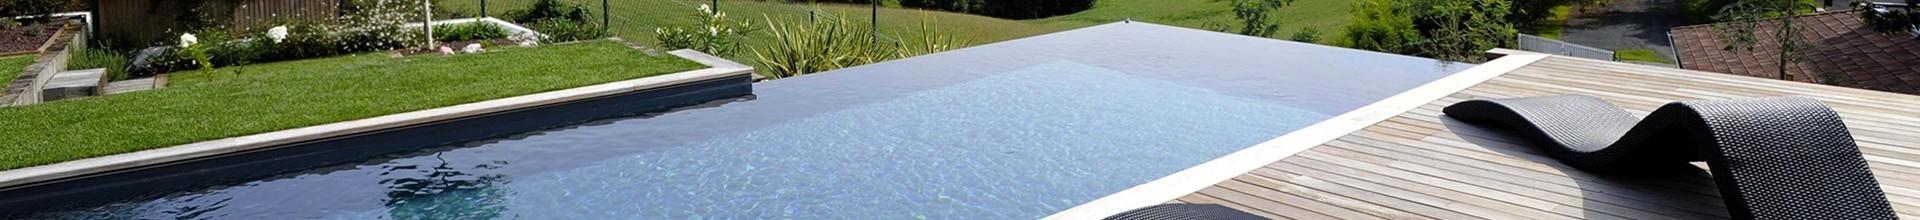 Direct usine, piscine coque prix Doubs